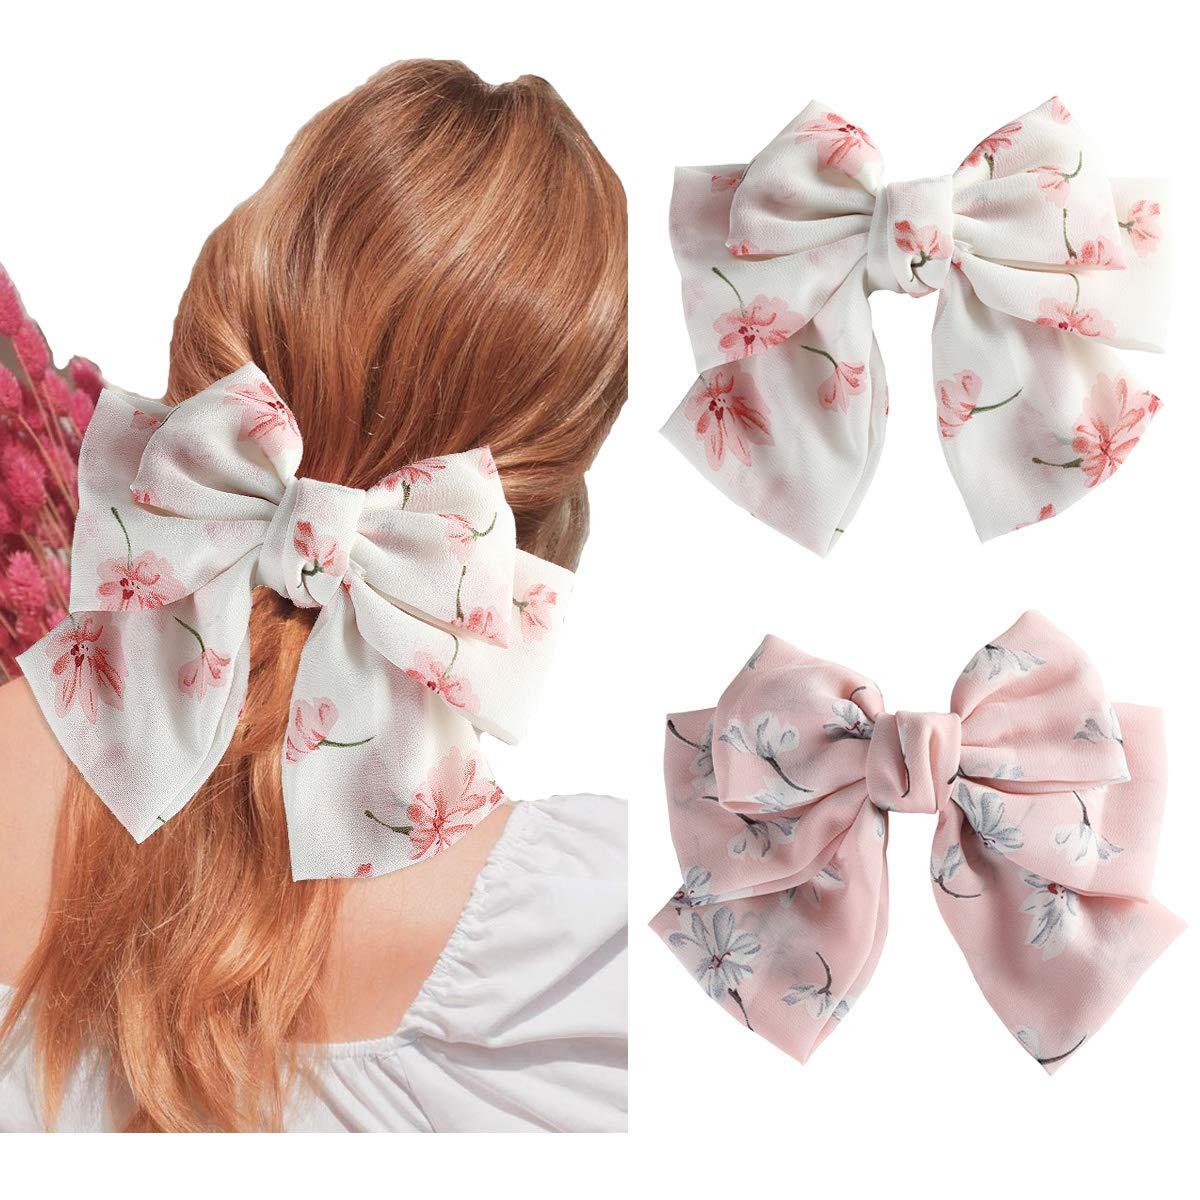 Girls Large Bowknot Hair Bow Hair Pins Clips Ribbon Hair Clip Hairband Gift